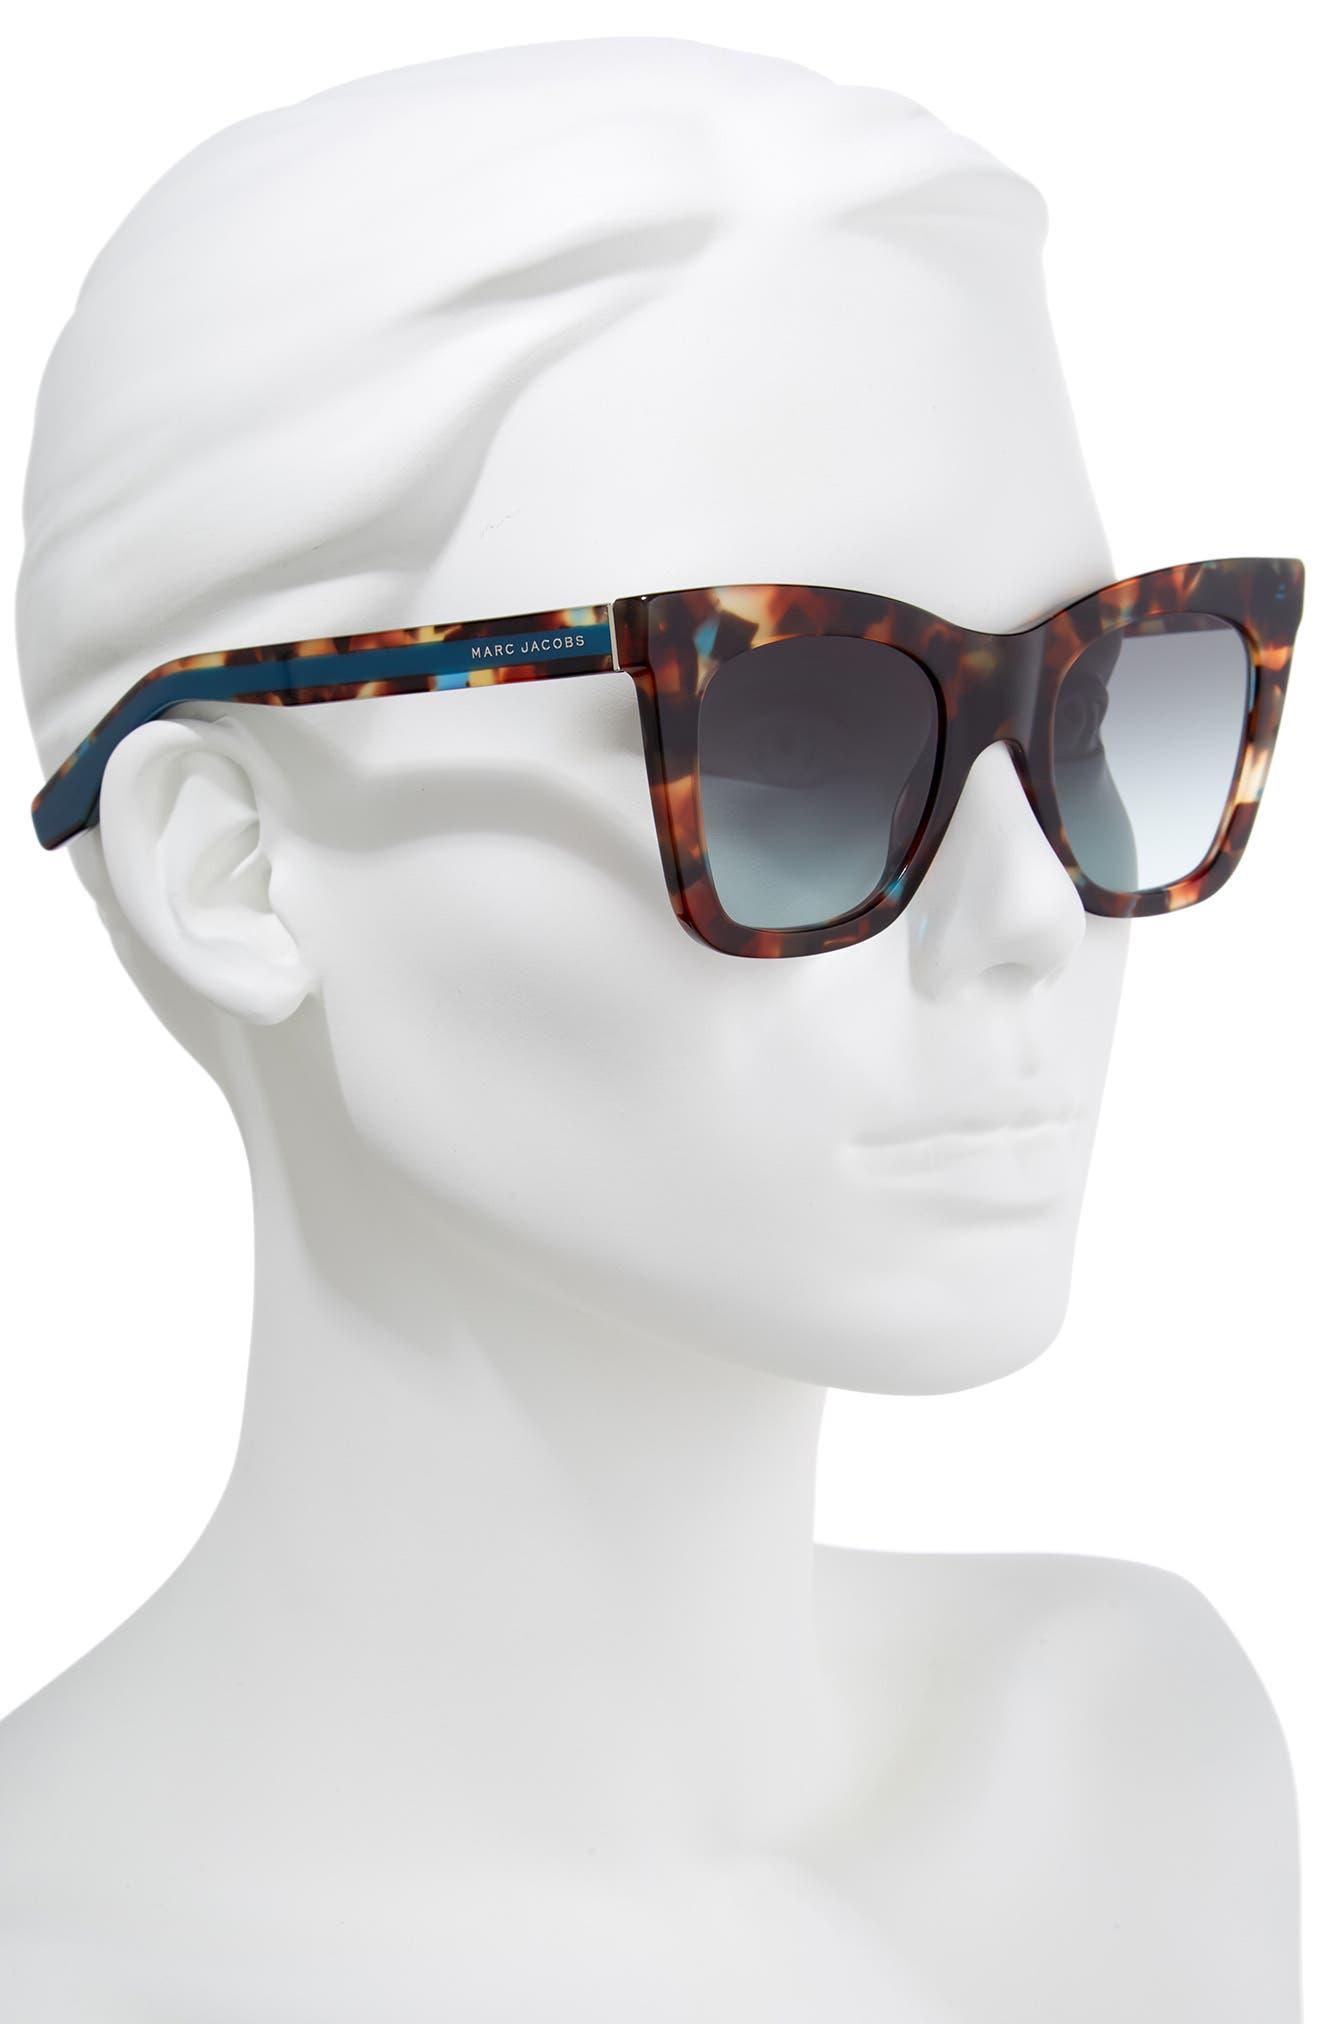 50mm Cat Eye Sunglasses,                             Alternate thumbnail 2, color,                             Havnturqu